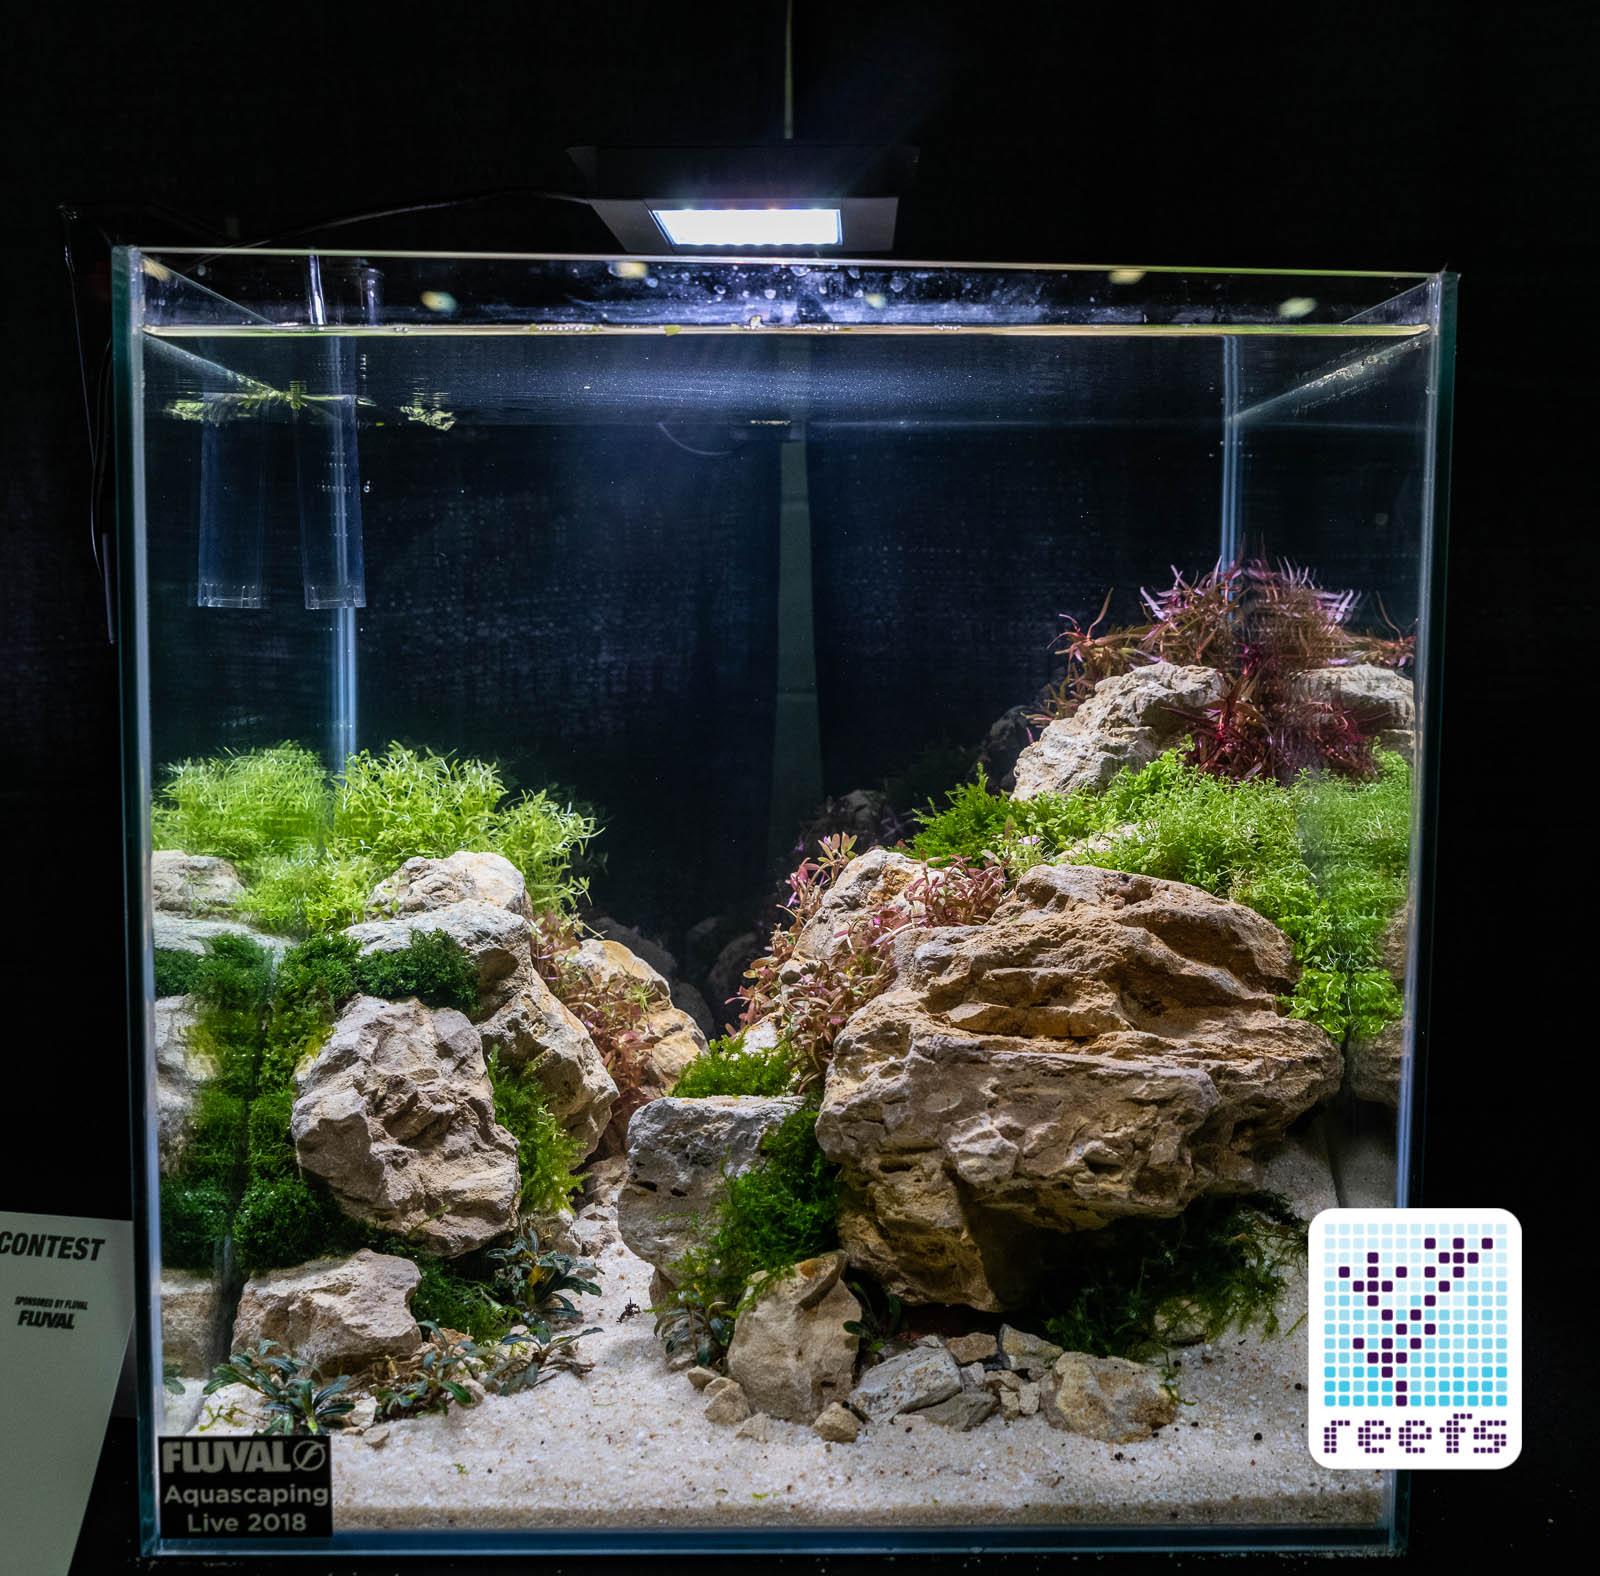 2018 Aquatic Experience Coverage Part Ii Aquascaping Contest